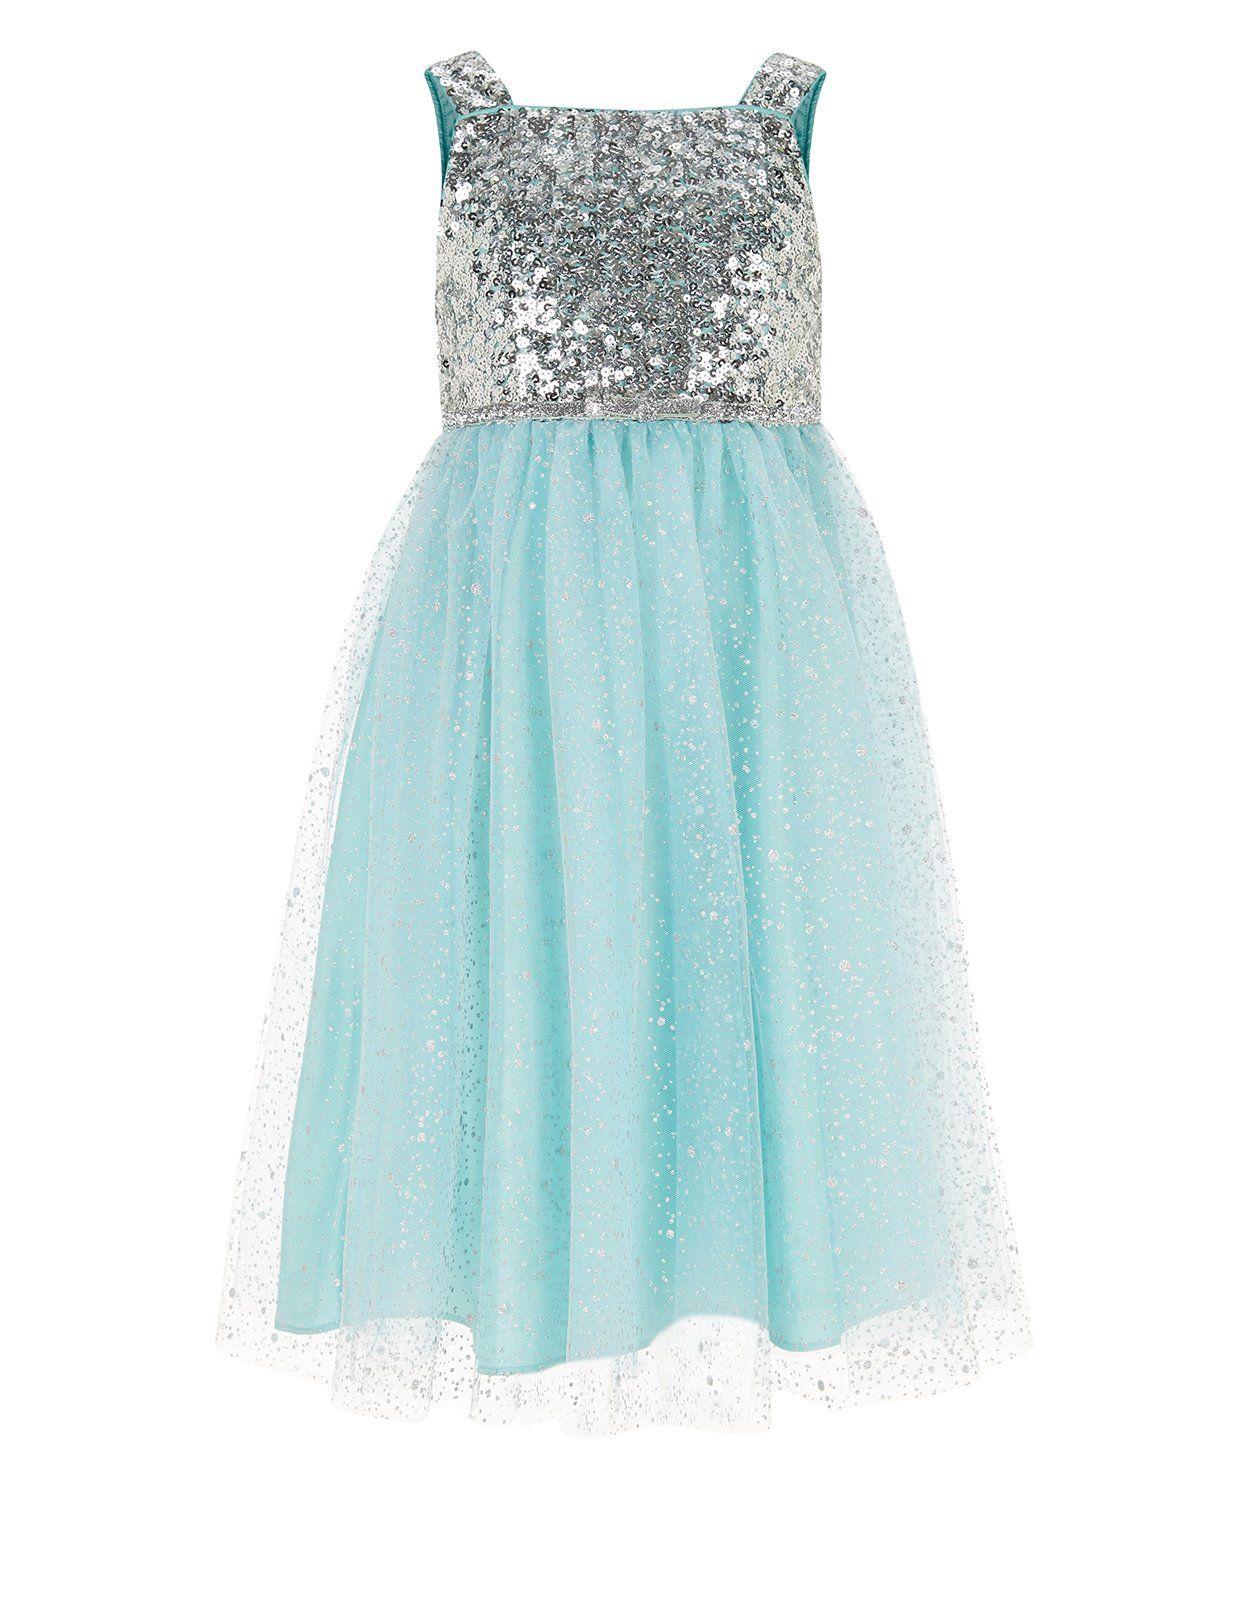 Amazon.com: Monsoon Girls Emile Dress: Clothing | Rachel\'s Dress ...